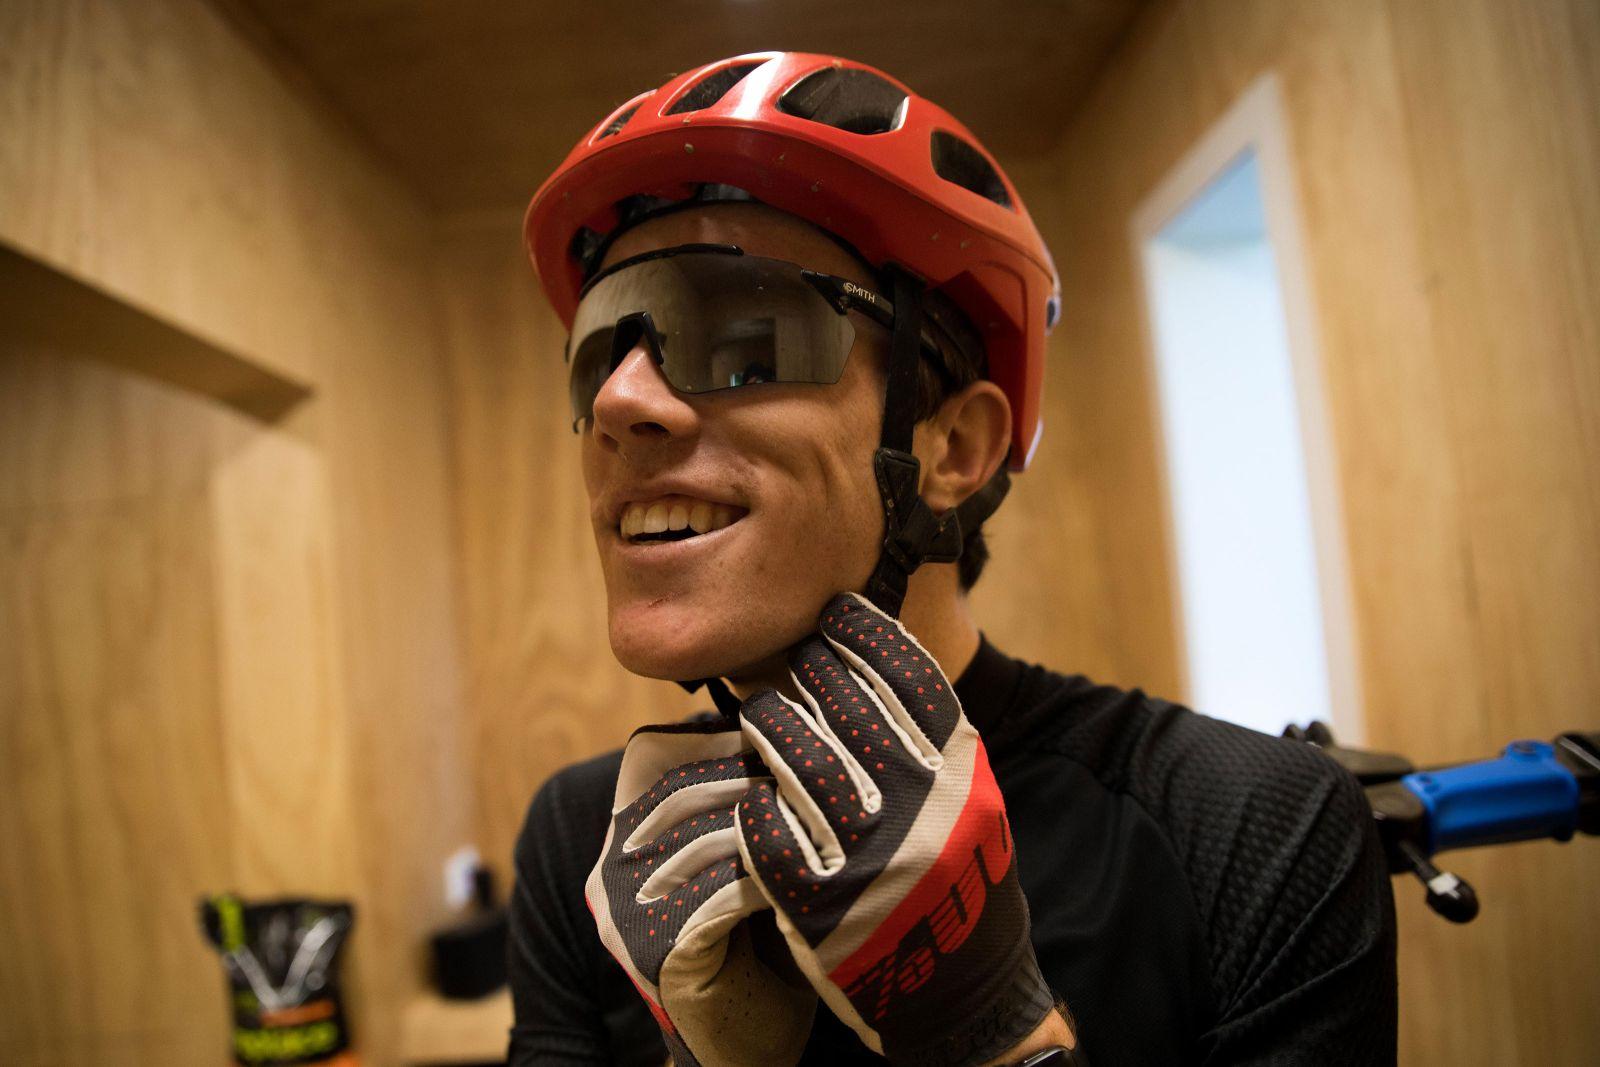 Putting on helmet in the bike lockup